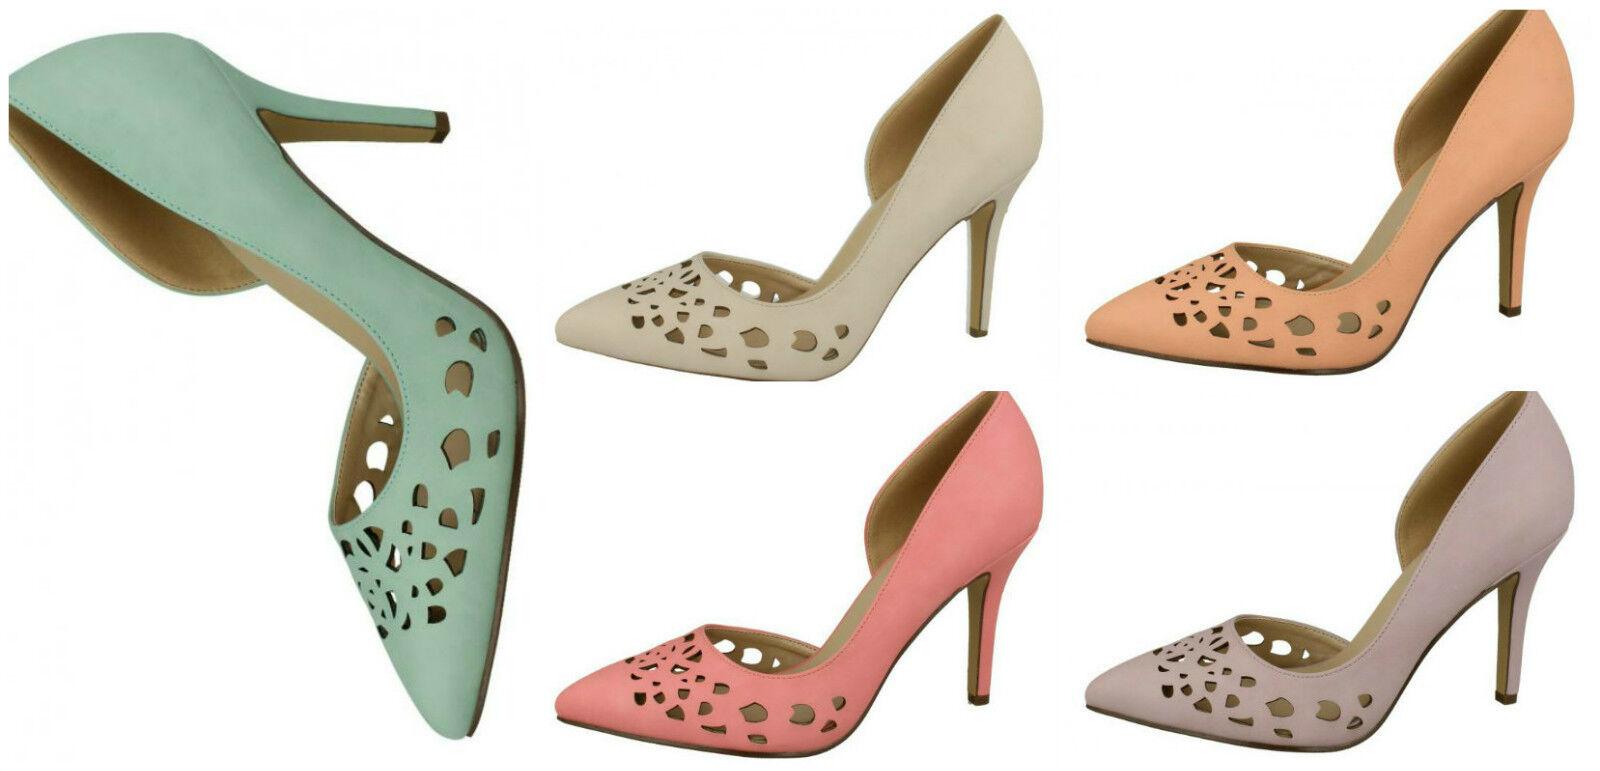 F9913- Ladies Anne Michelle Cut Out Colours- Court Shoes- 5 Pastel Colours- Out Great Price c443ed